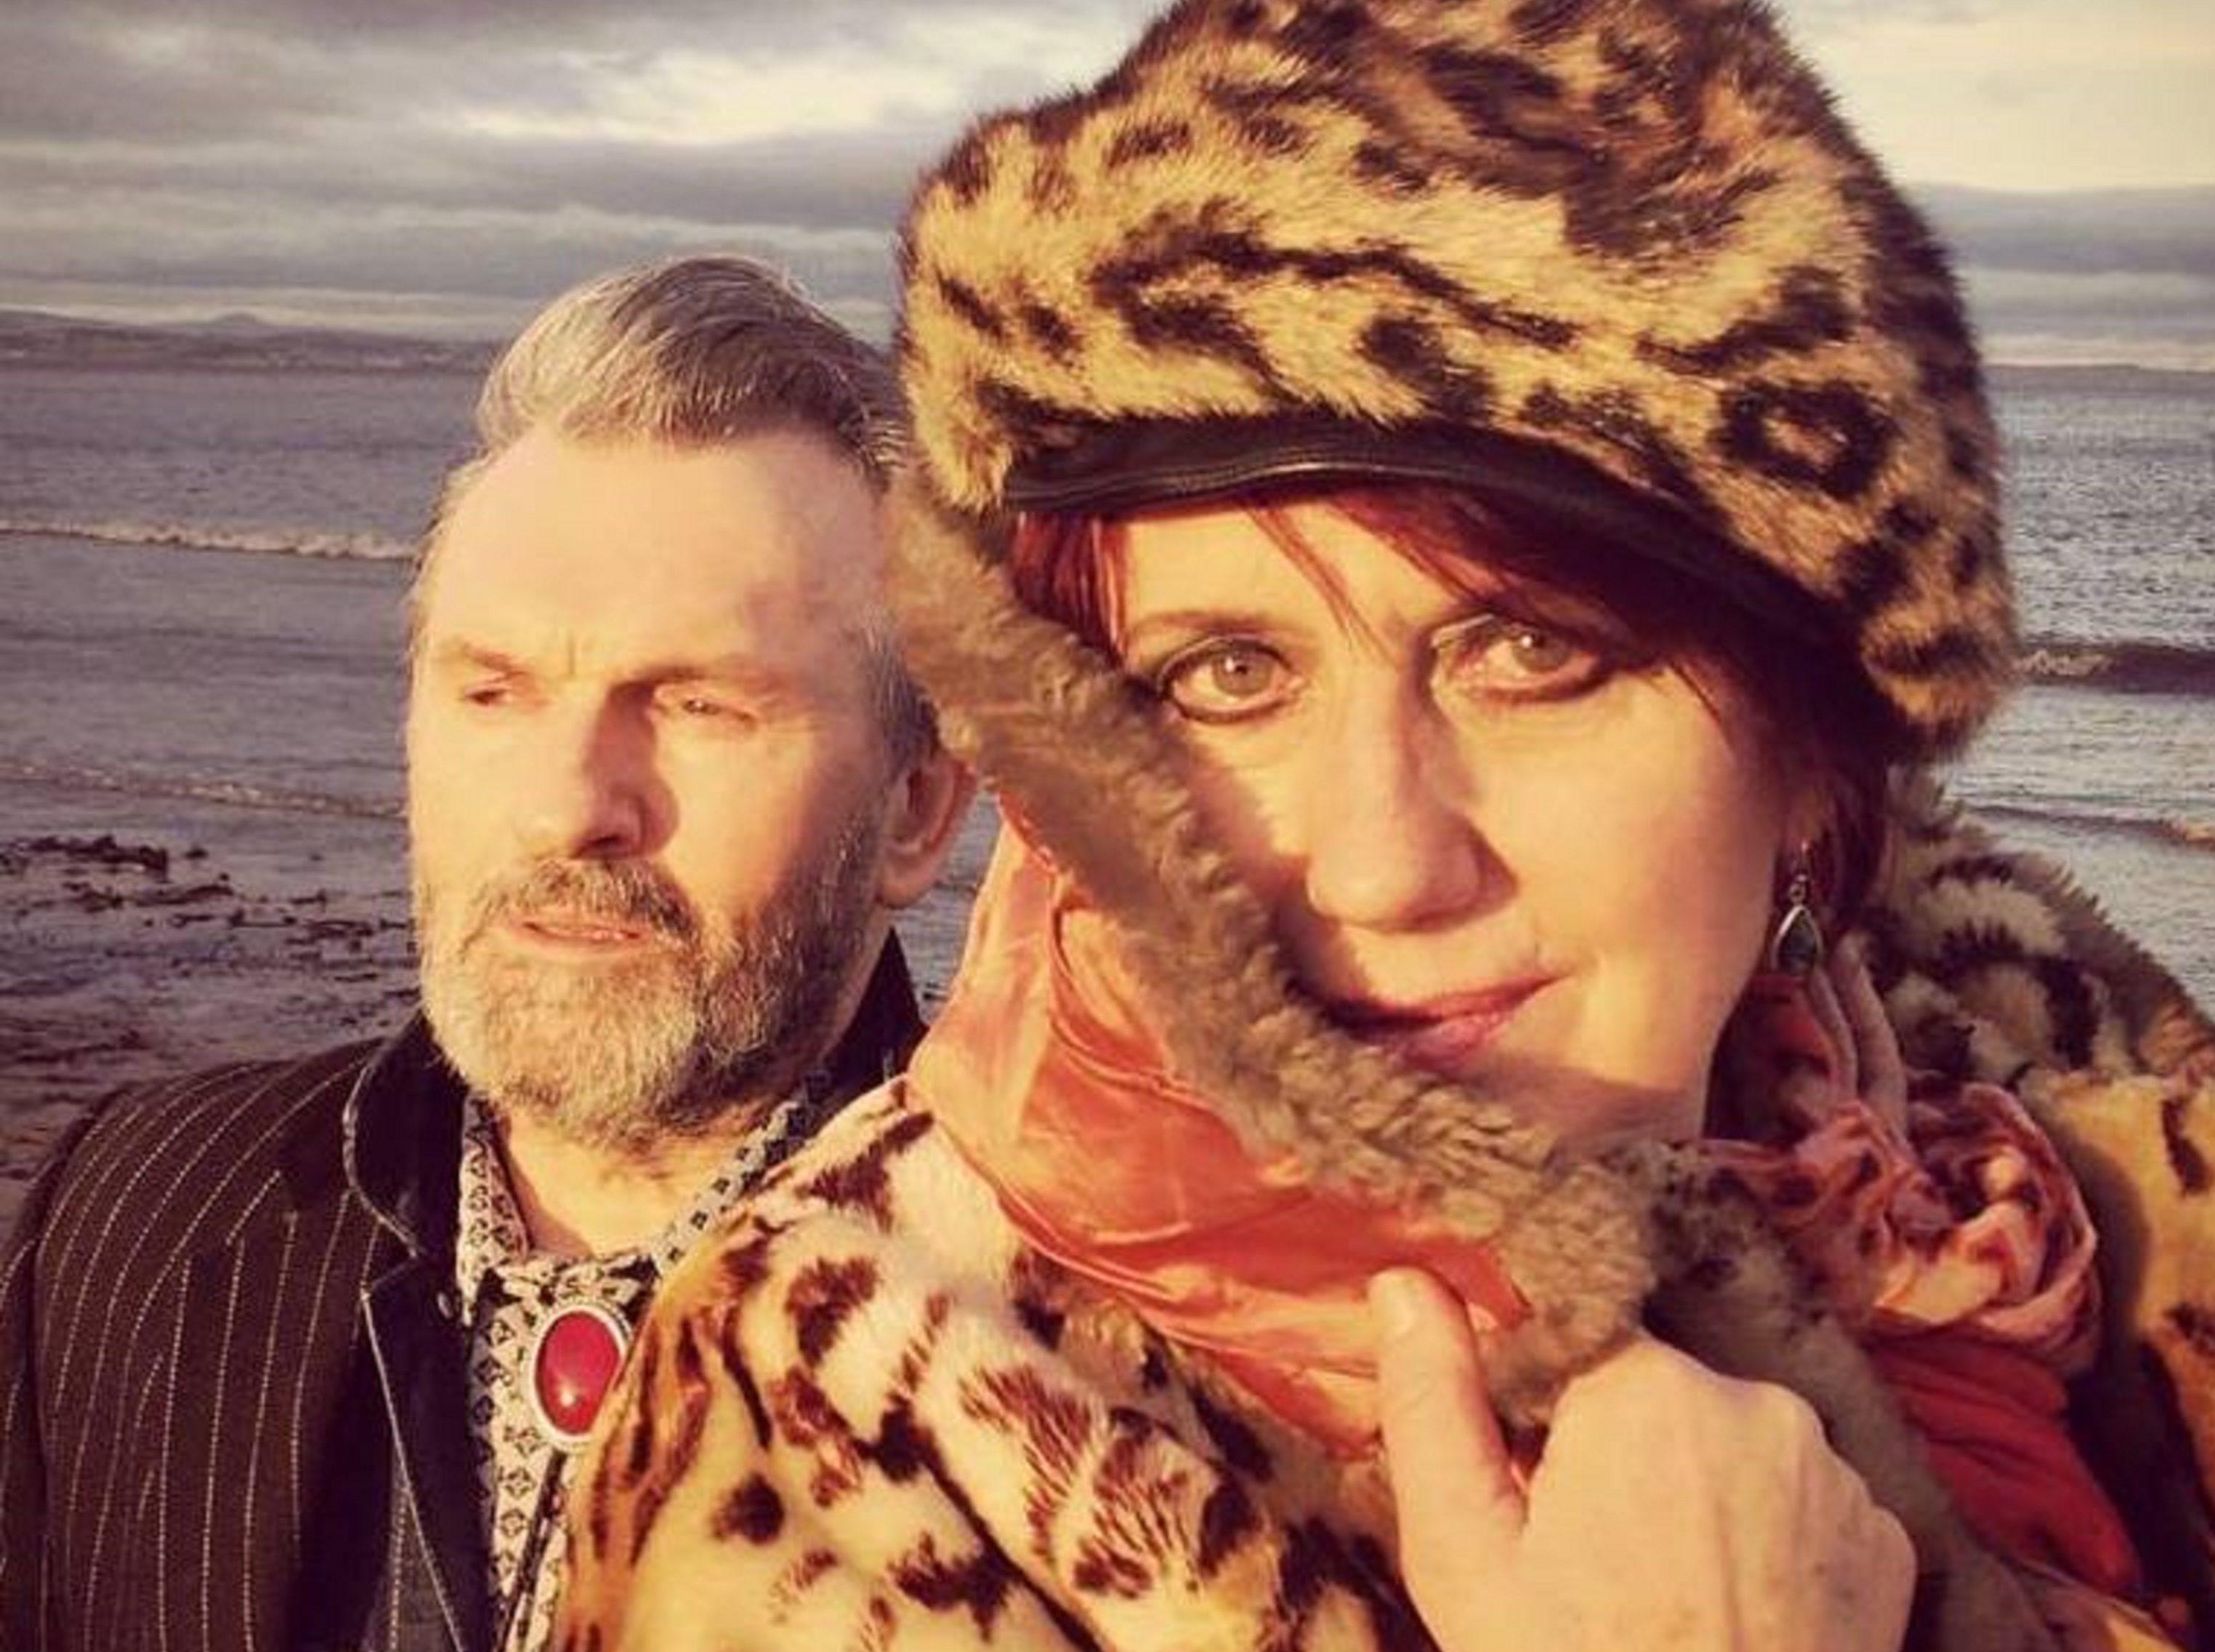 Allan Mcdowall and Fay Fife, aka Countess Of Fife. Photo: Liz Tainsh.